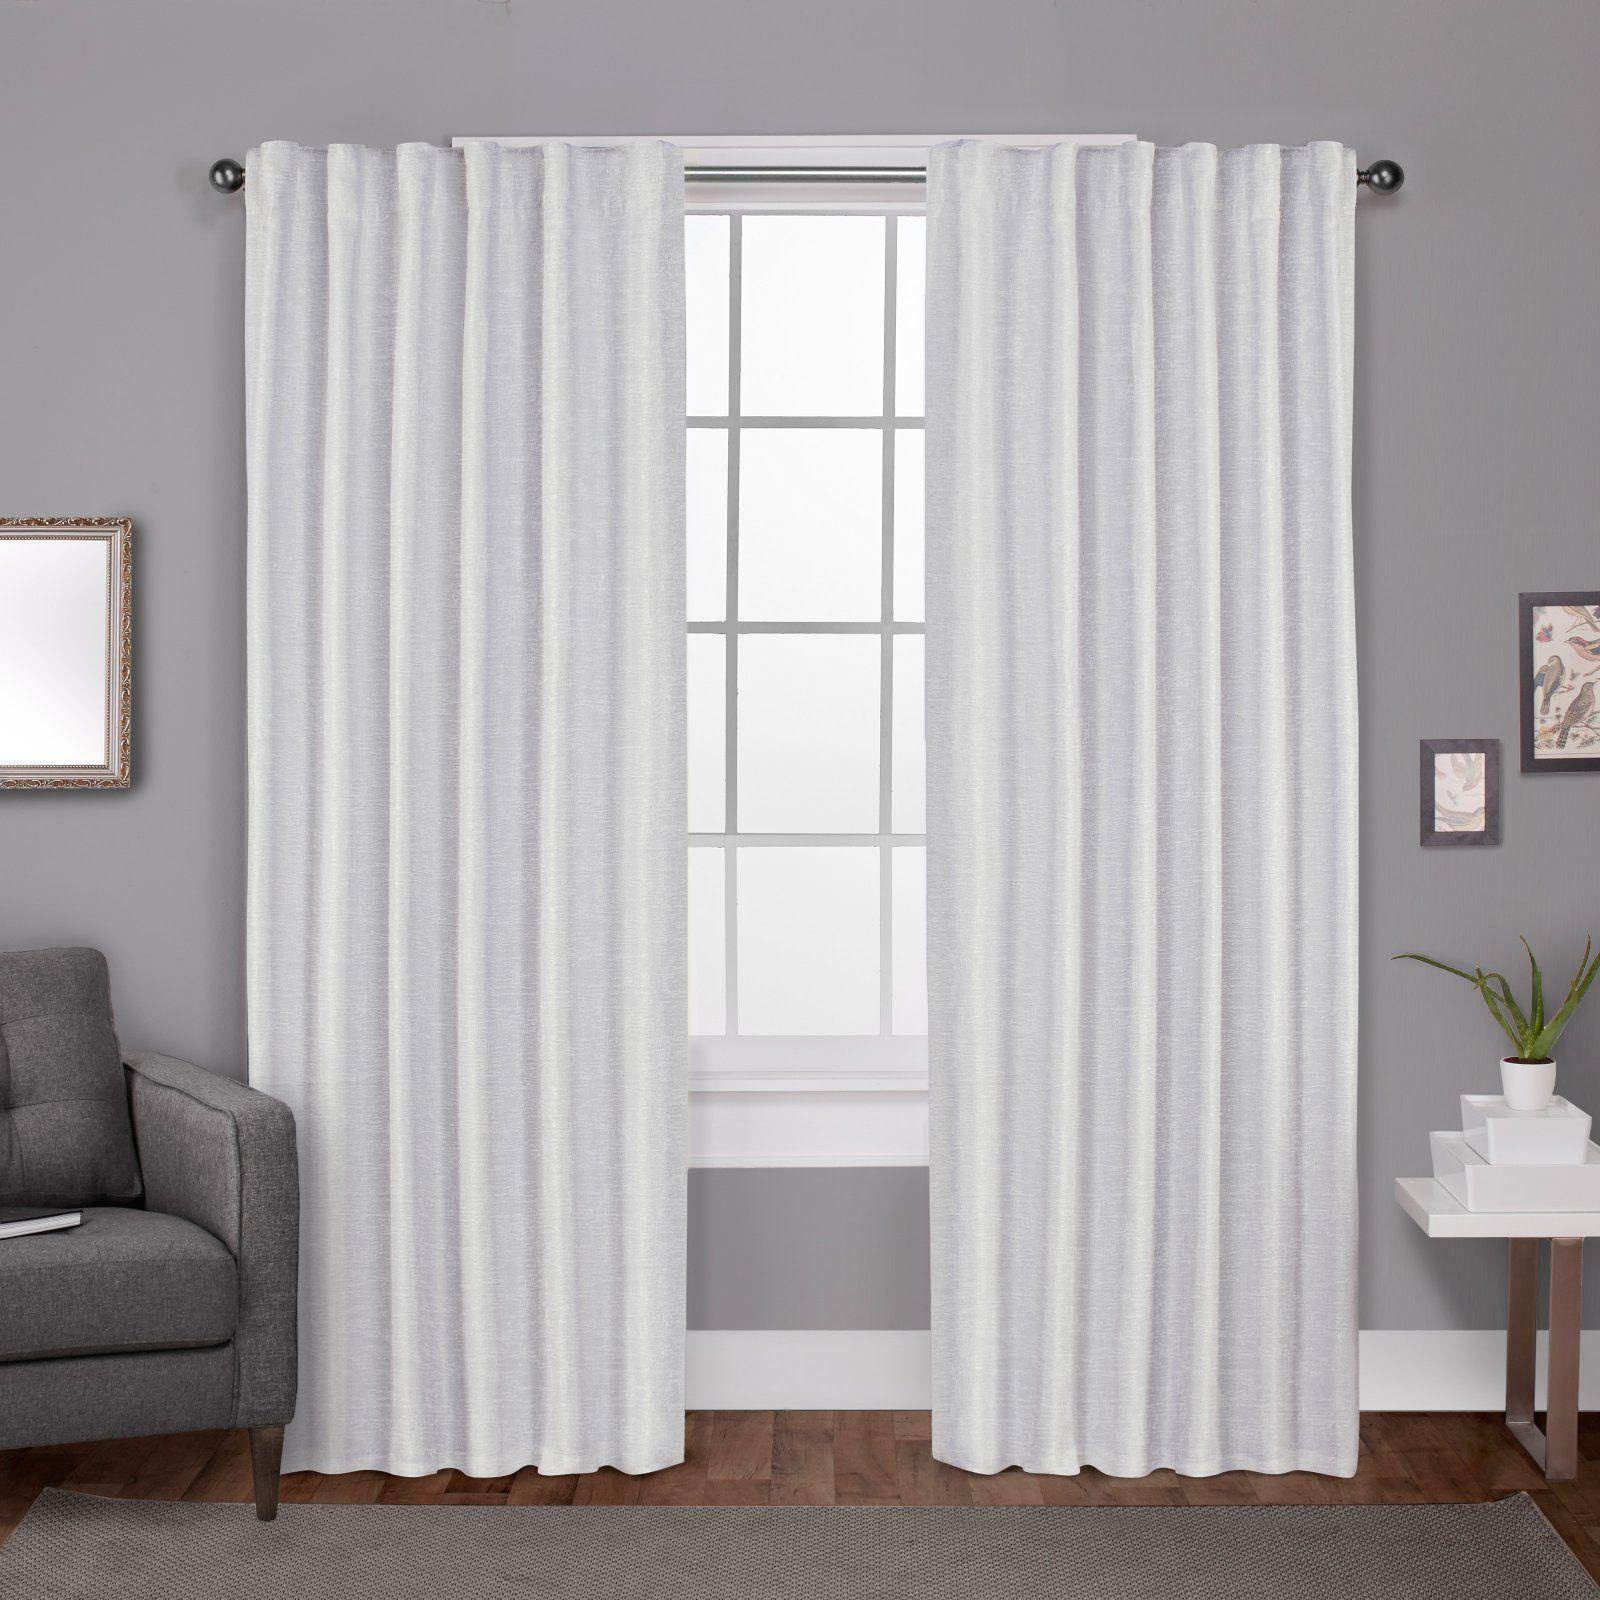 Exclusive Home Zeus Textured Jacquard Blackout Hidden Tab Curtain